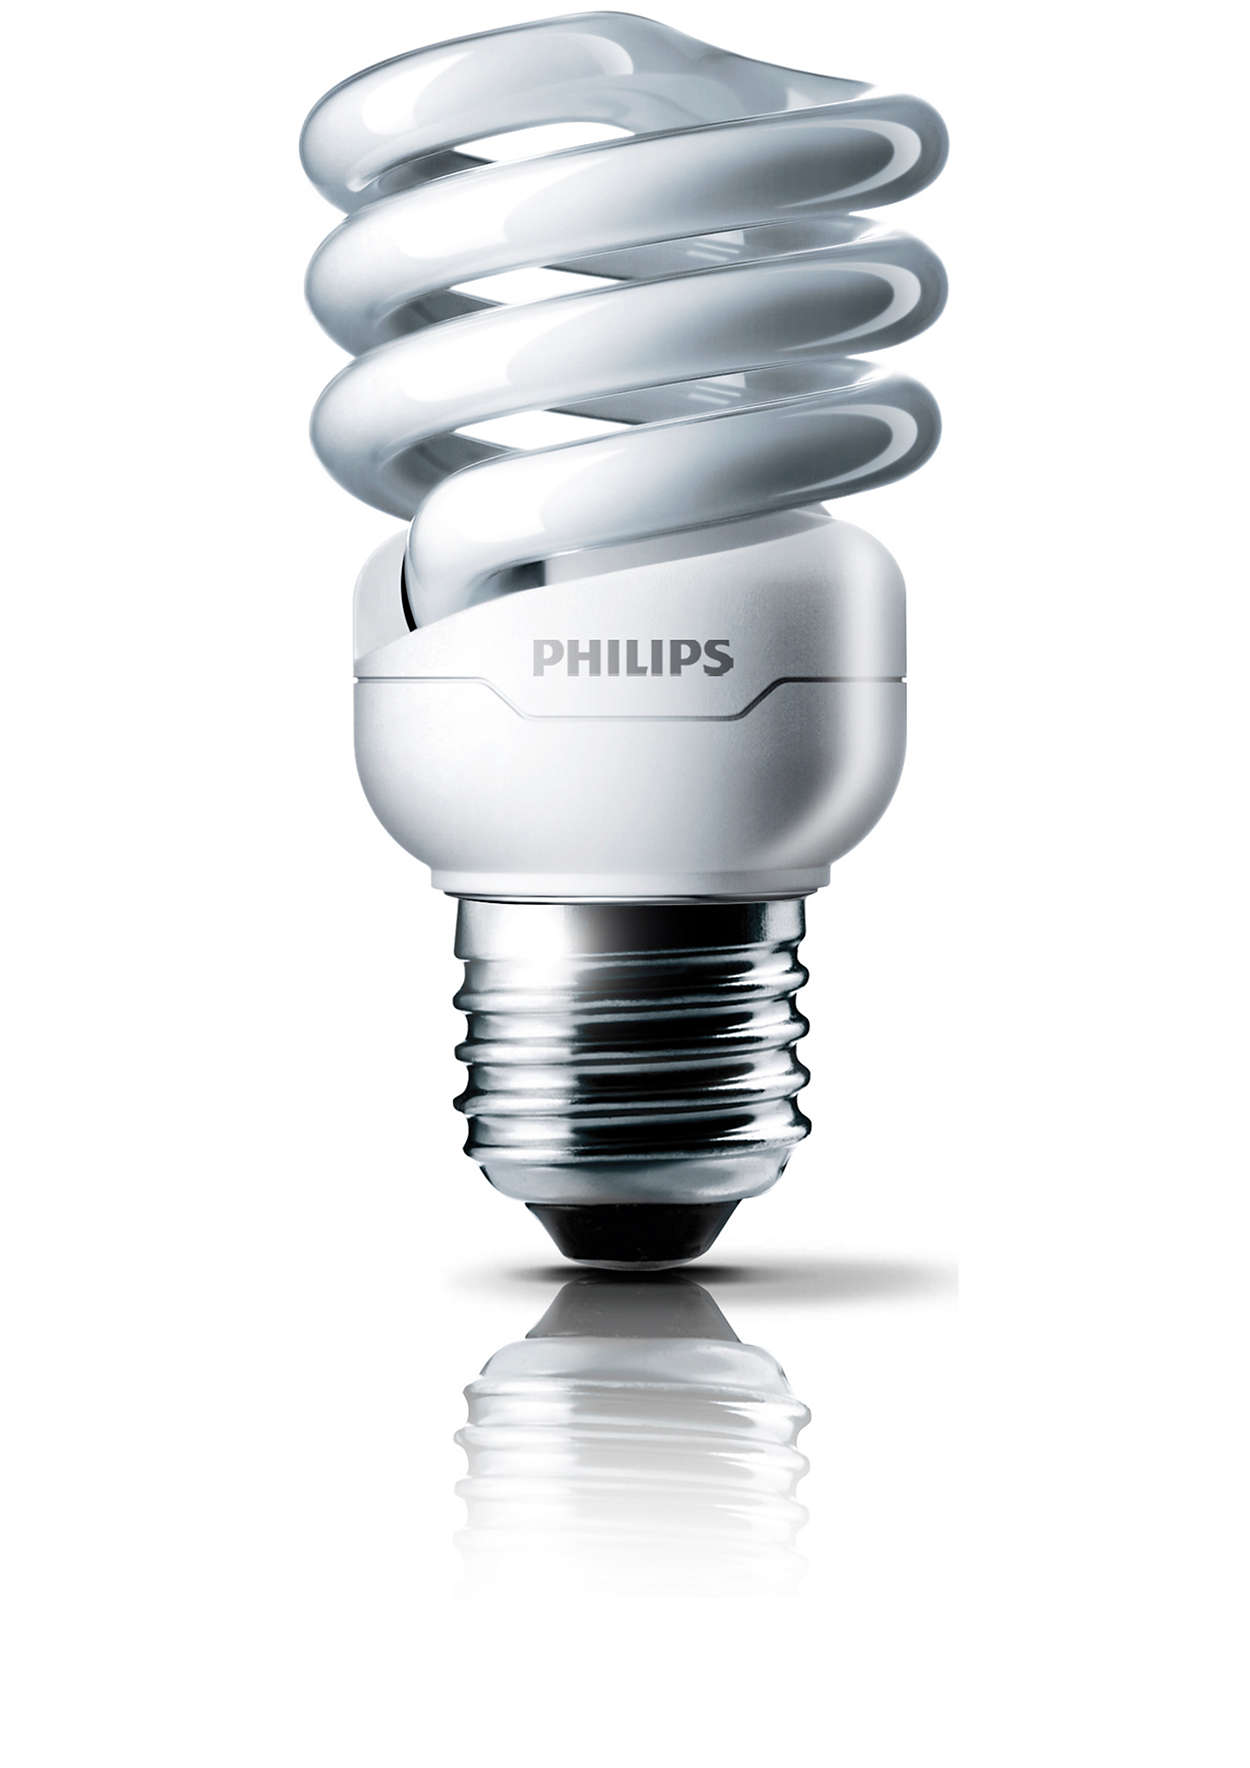 Energy Efficient Light Bulbs PNG - 163003